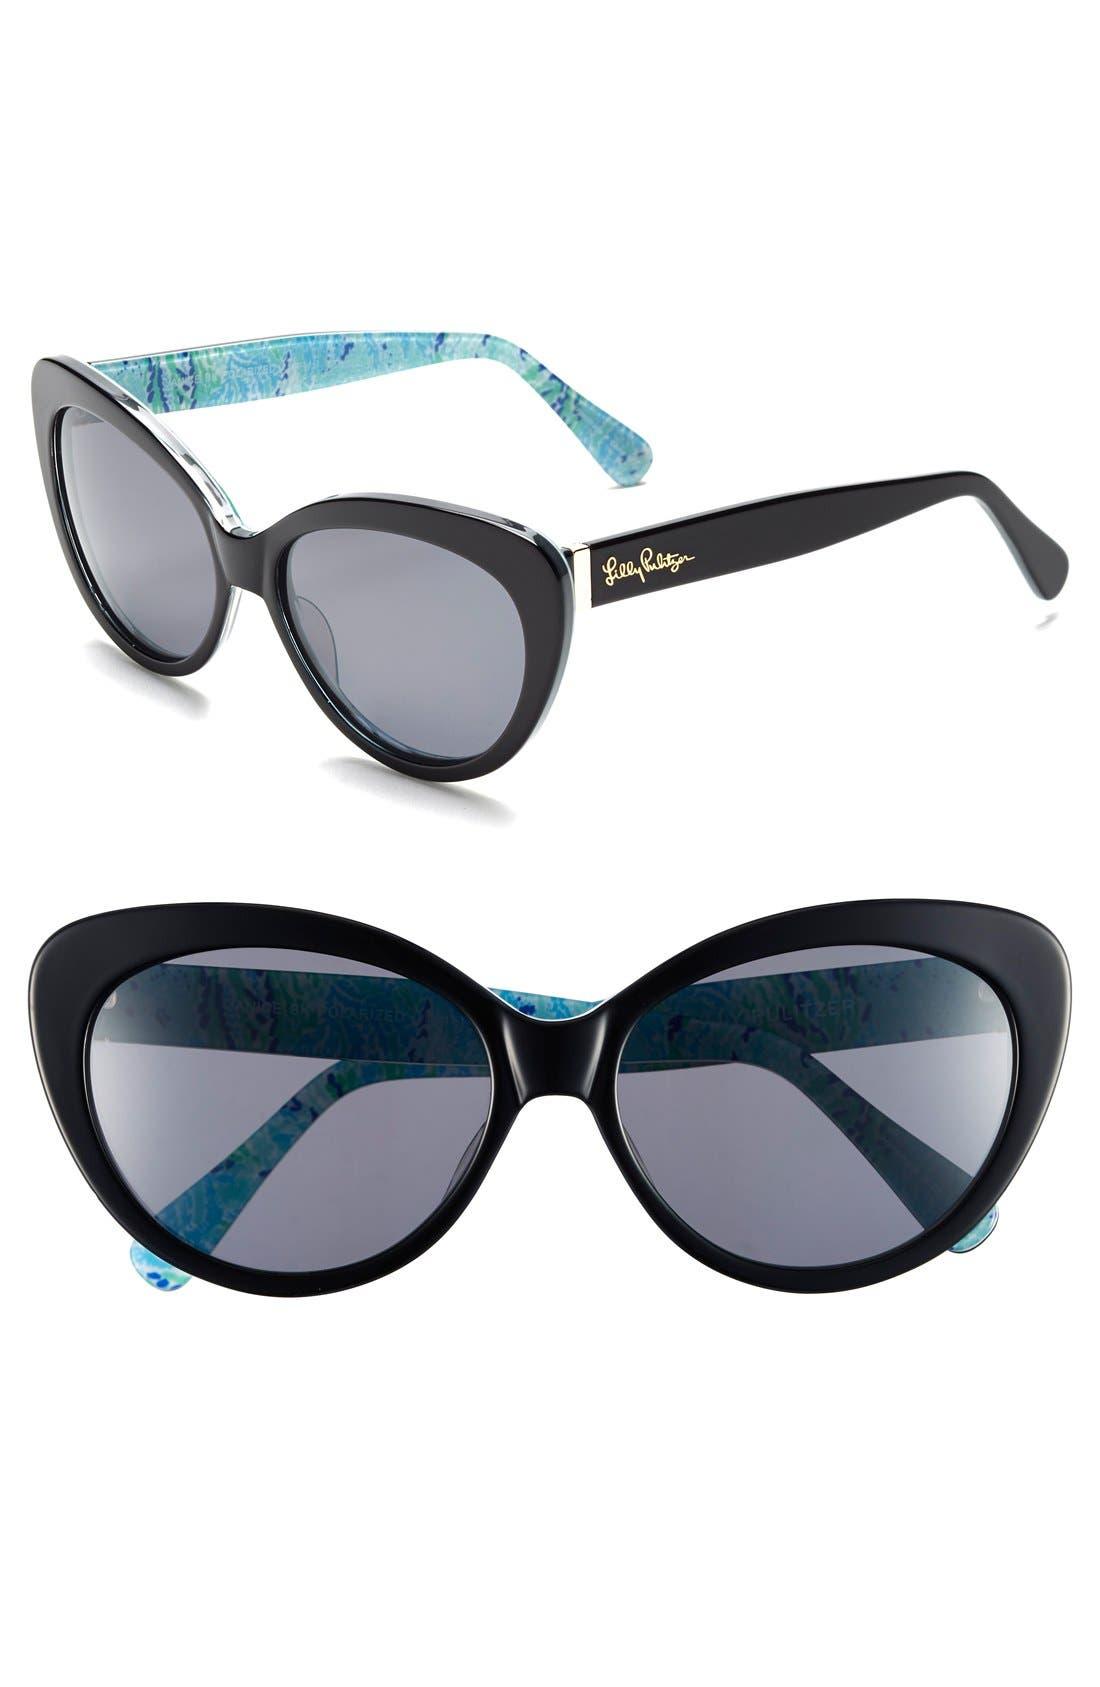 Alternate Image 1 Selected - Lilly Pulitzer® 'Janice' 58mm Polarized Sunglasses